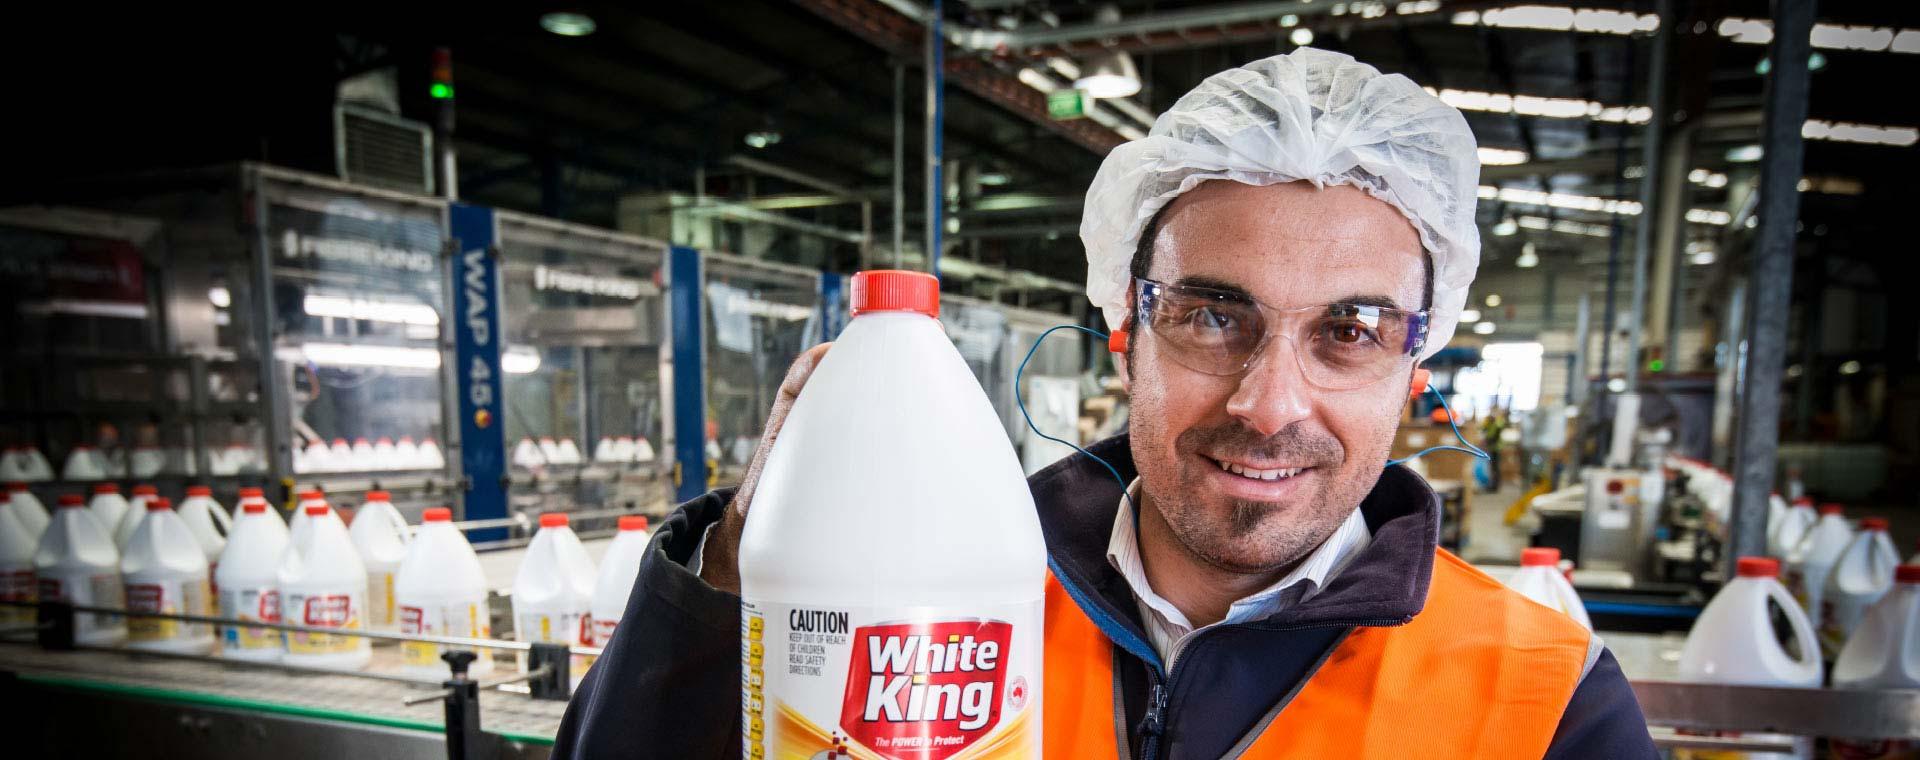 Pental worker holding up bottle of White King